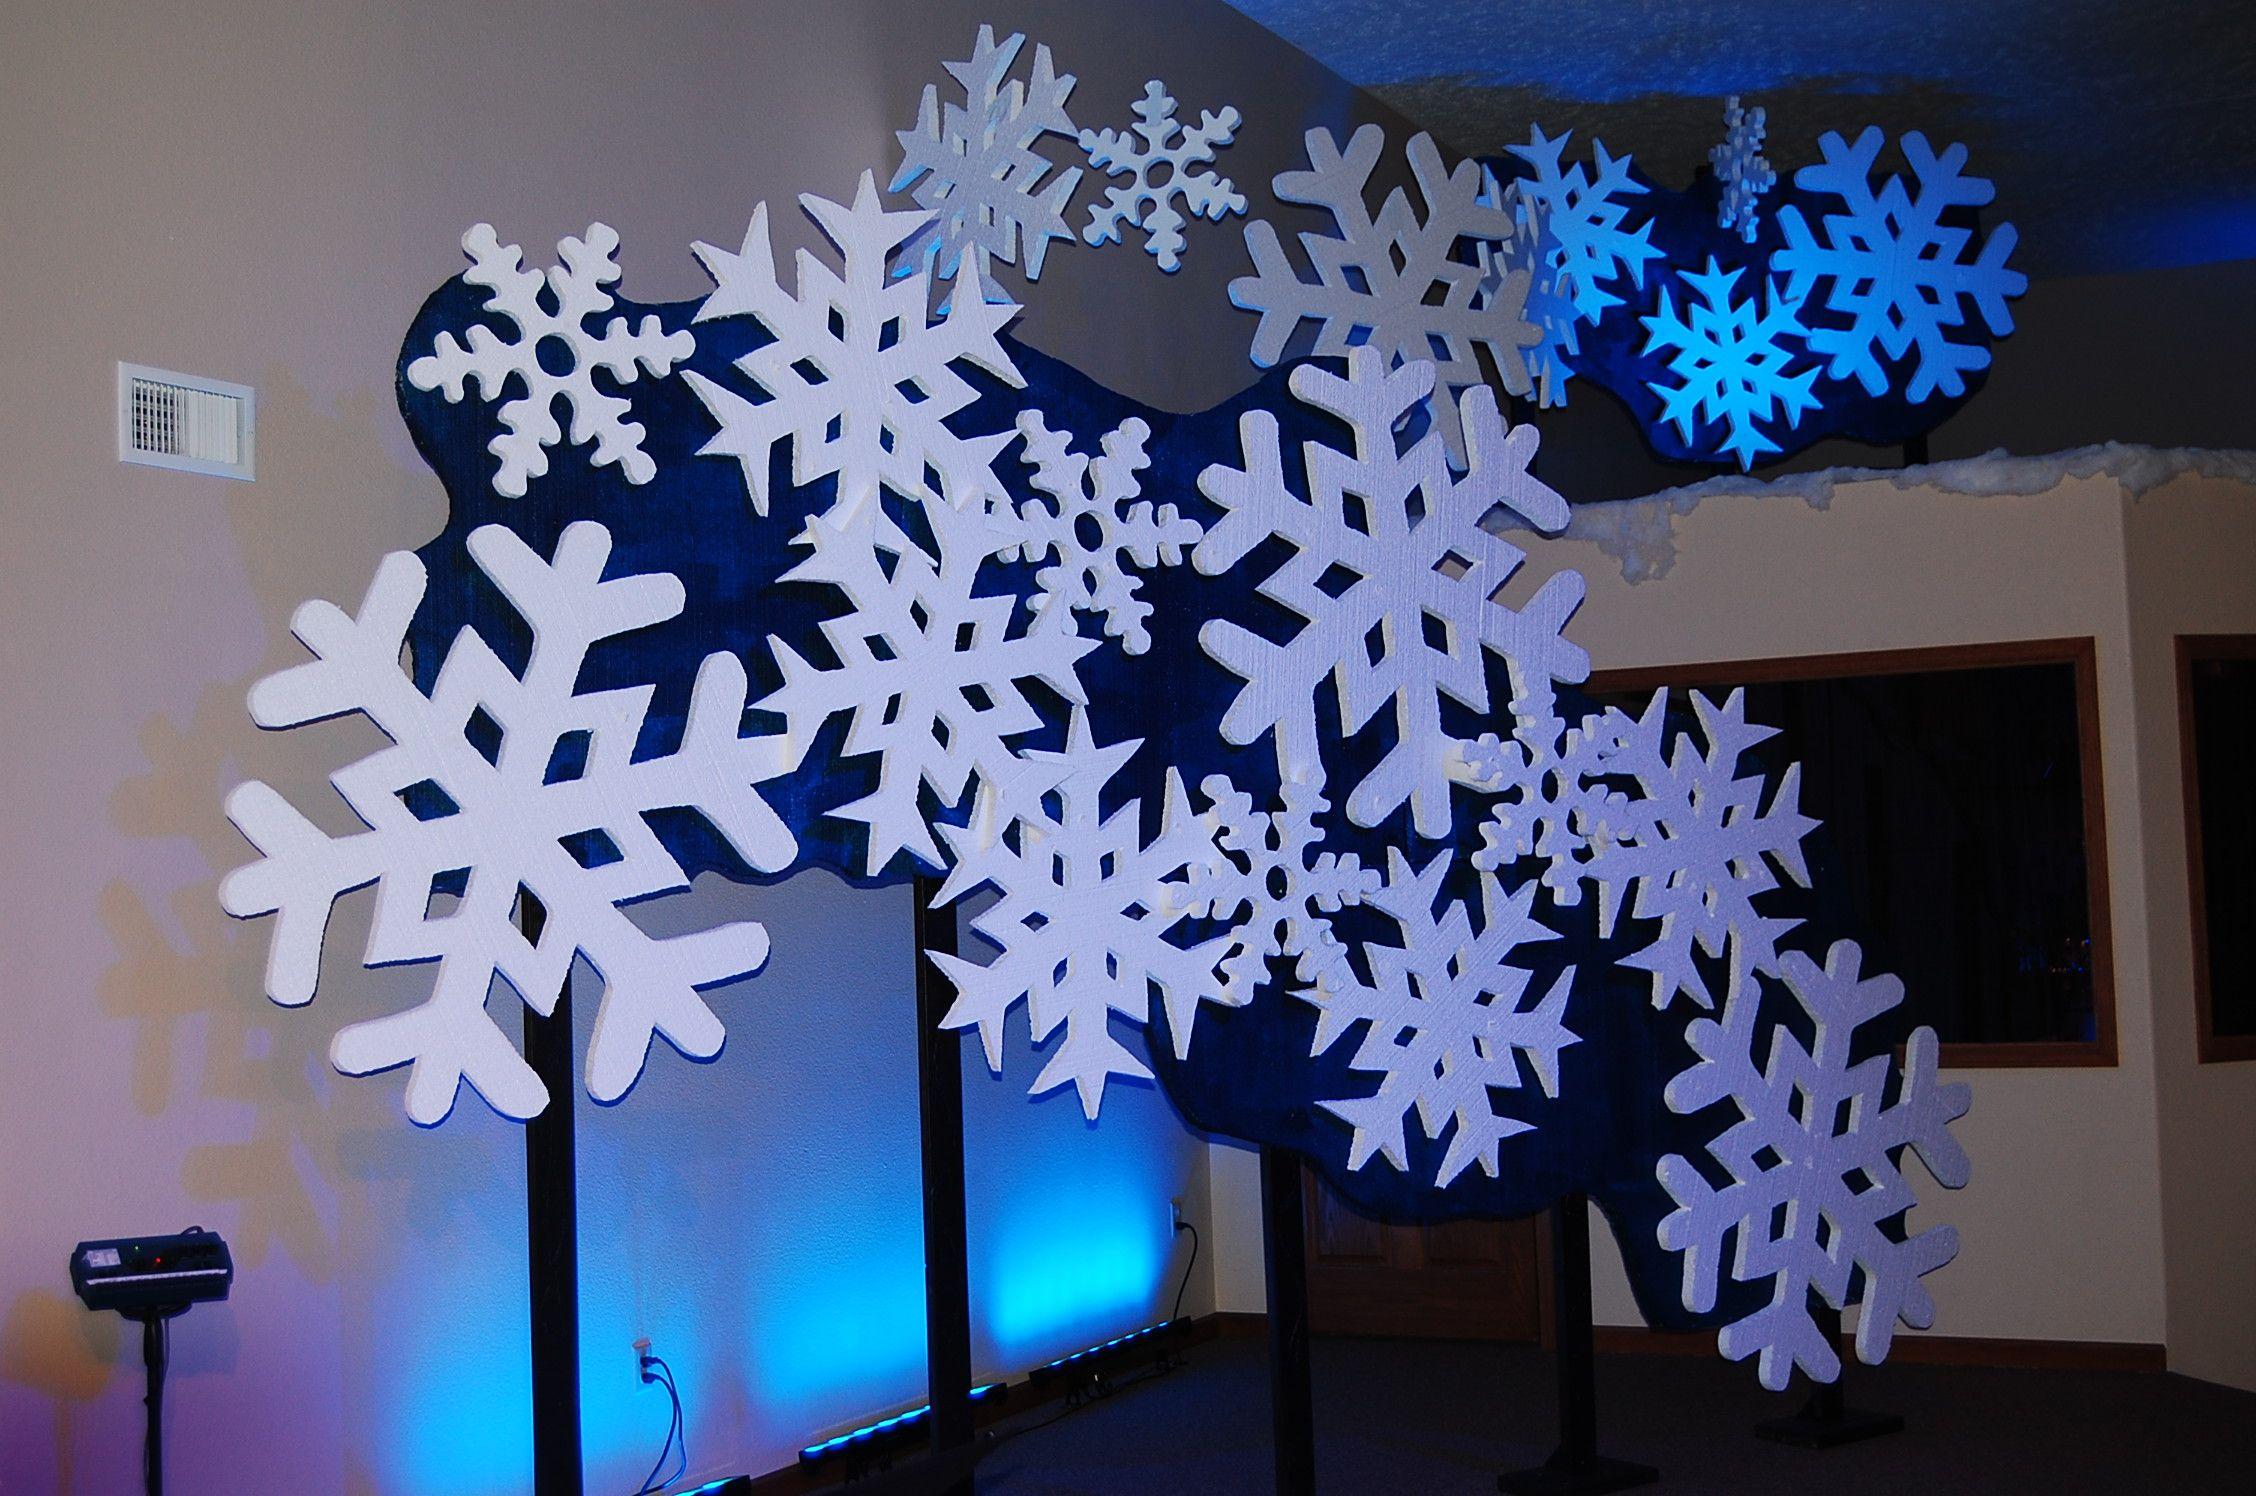 Snowflakes Falling Everywhere Christmas stage, Christmas